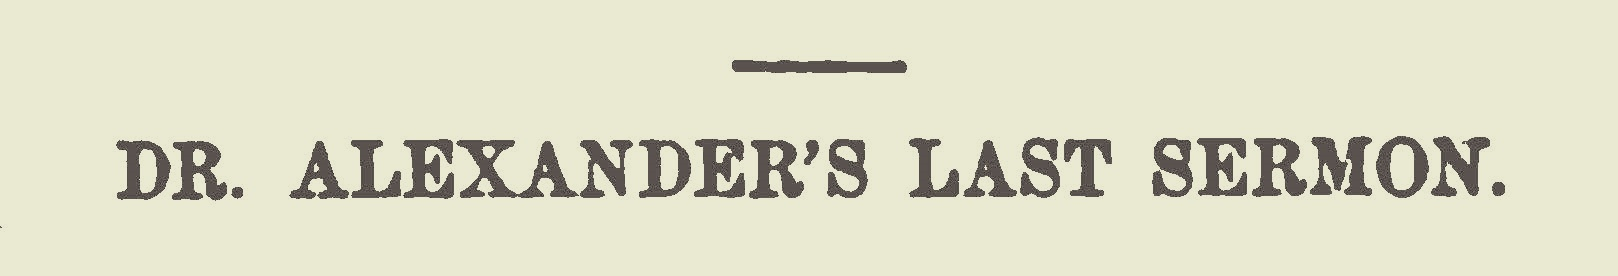 Alexander, Archibald, Dr. Alexander's Last Sermon Title Page.jpg